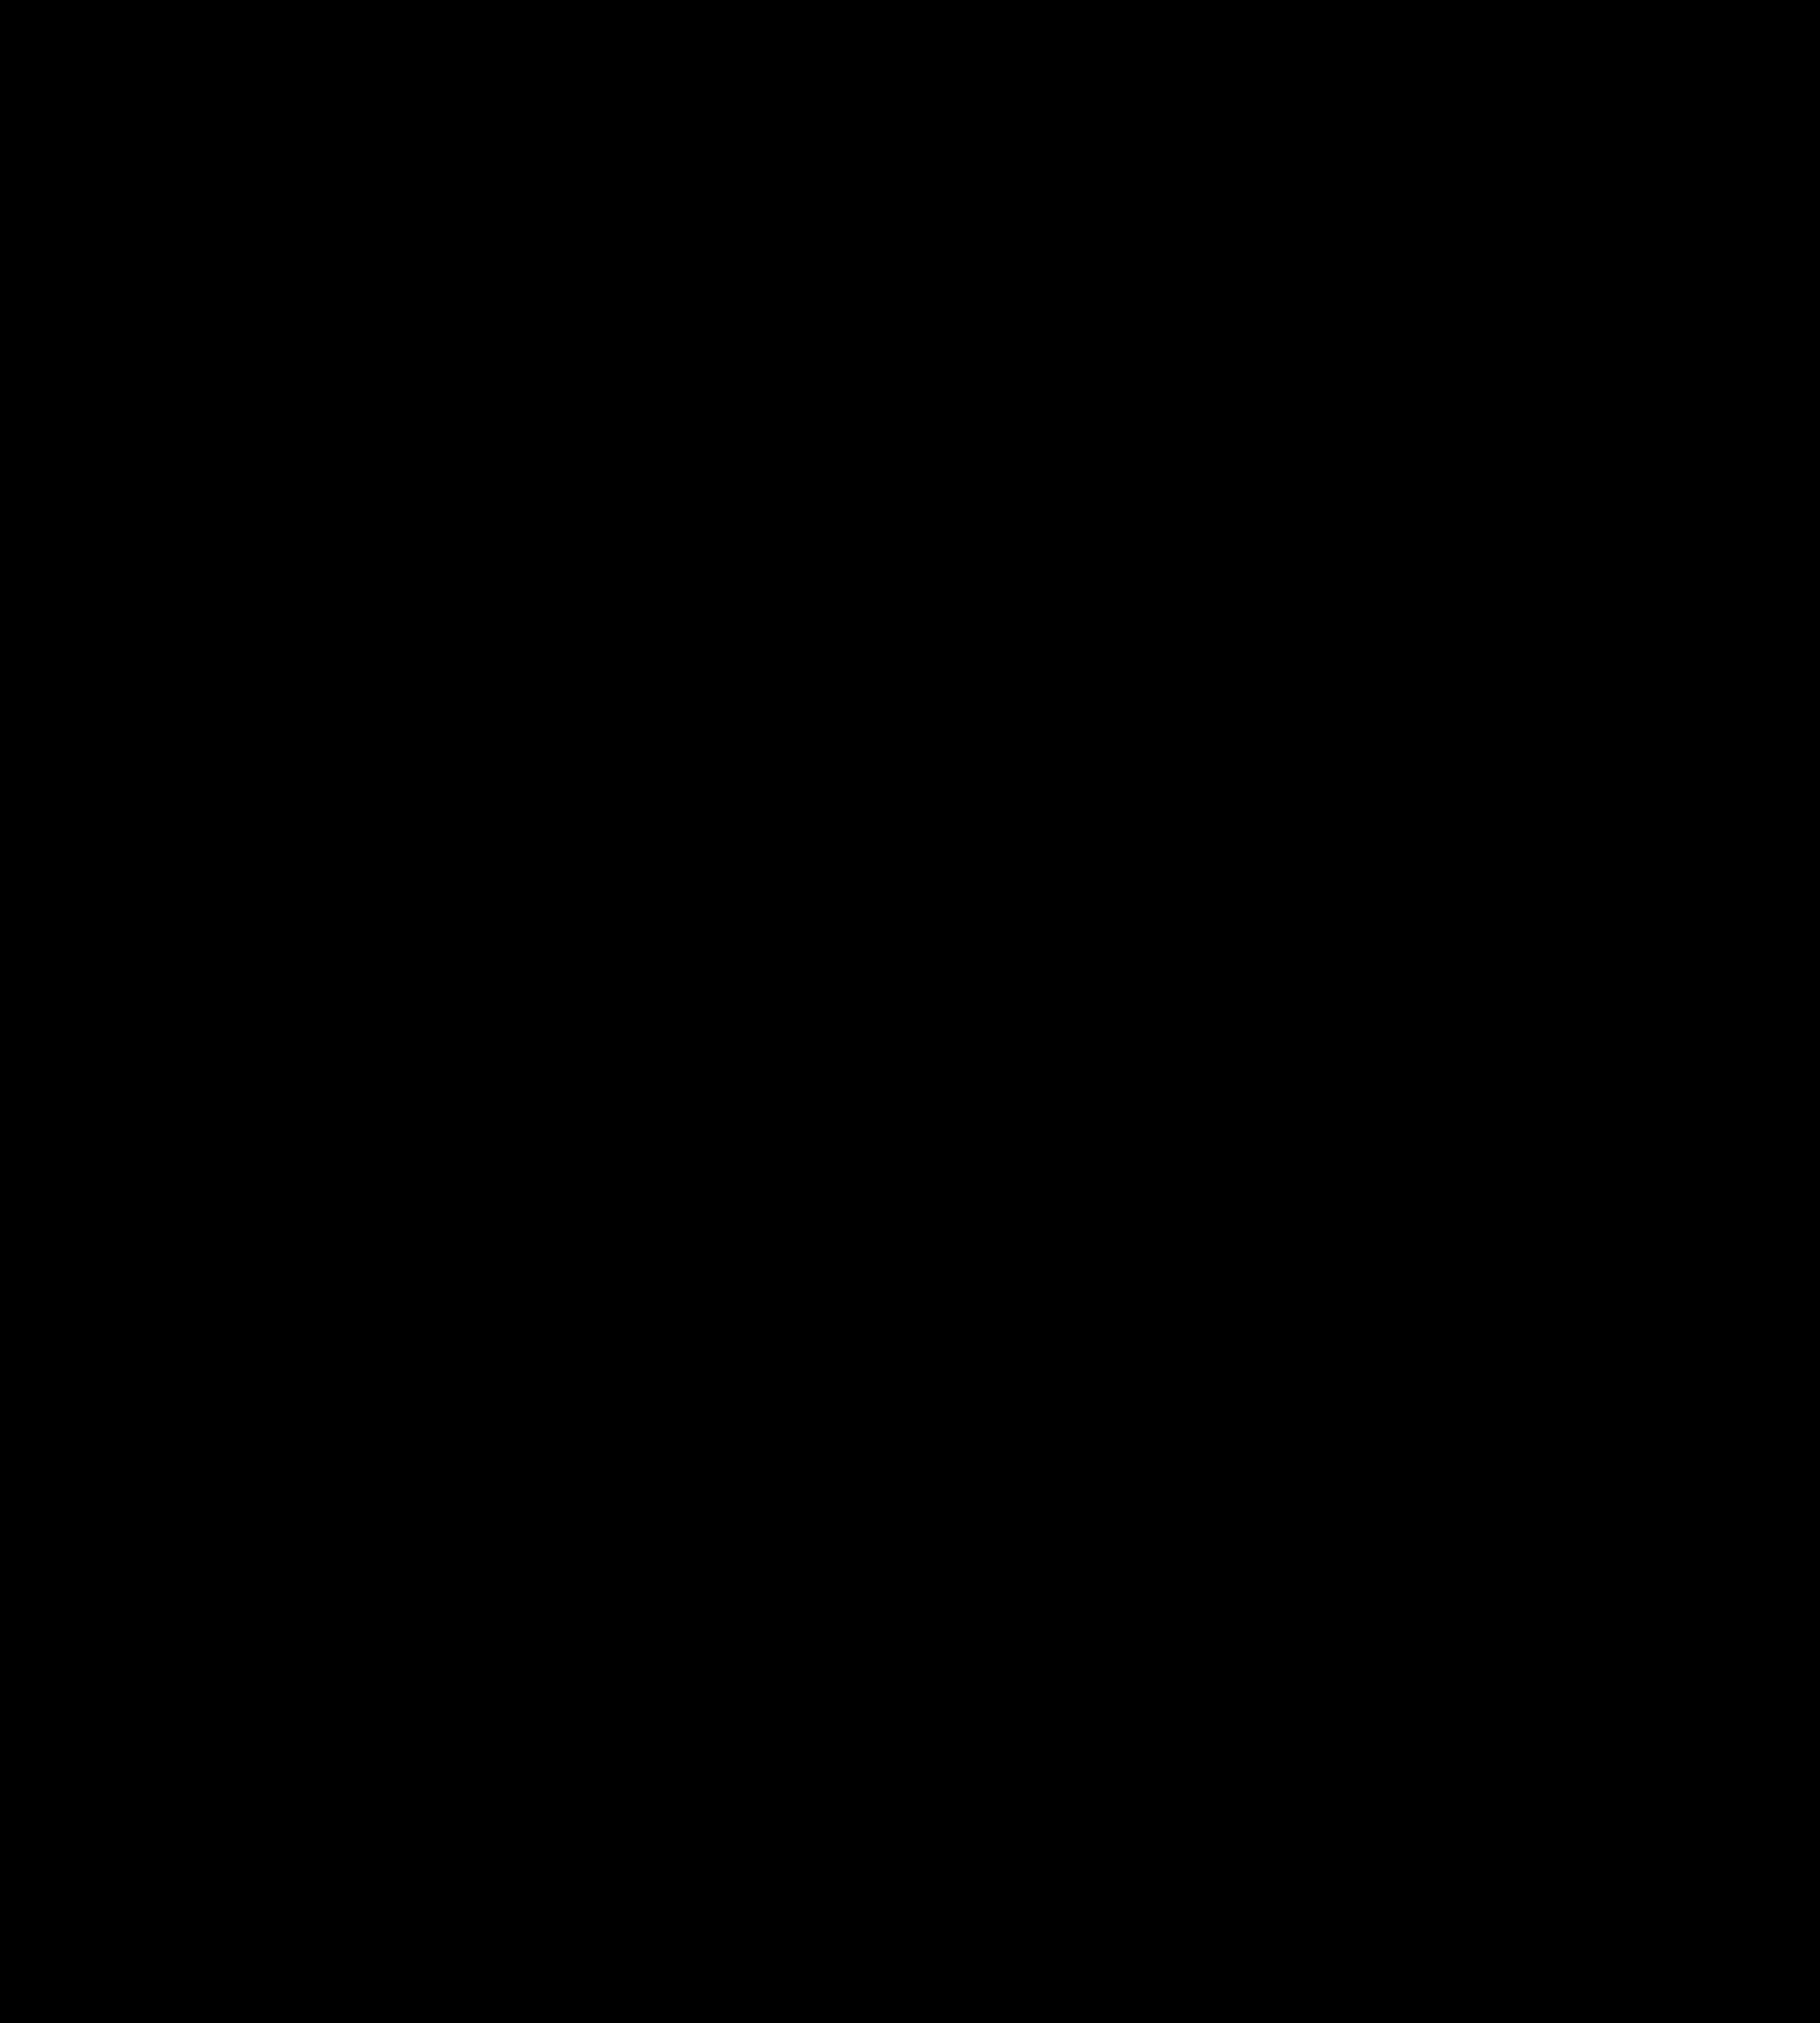 Church Drawing Gambar Sketsa Gereja Kristen